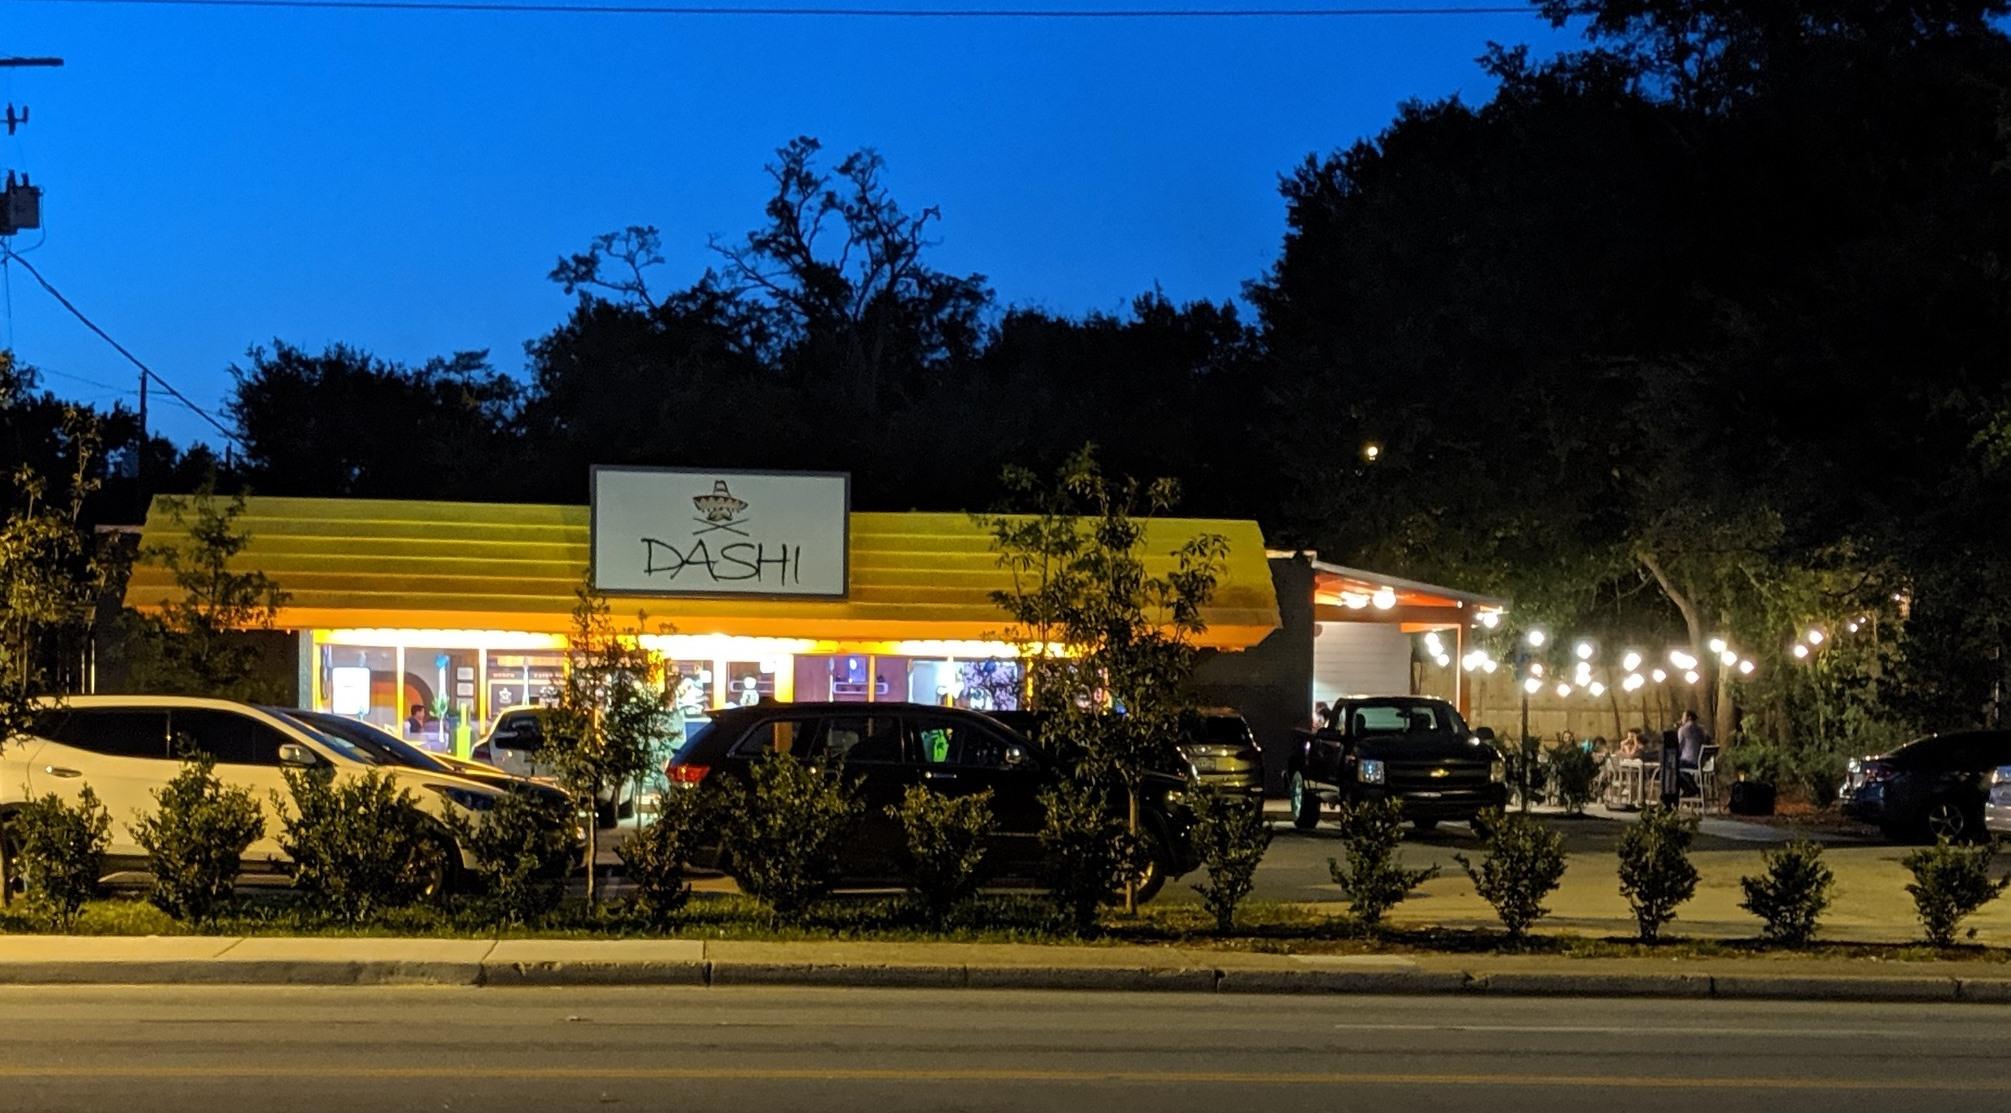 North Charleston Restaurant Dashi Bites Back After Bad Review